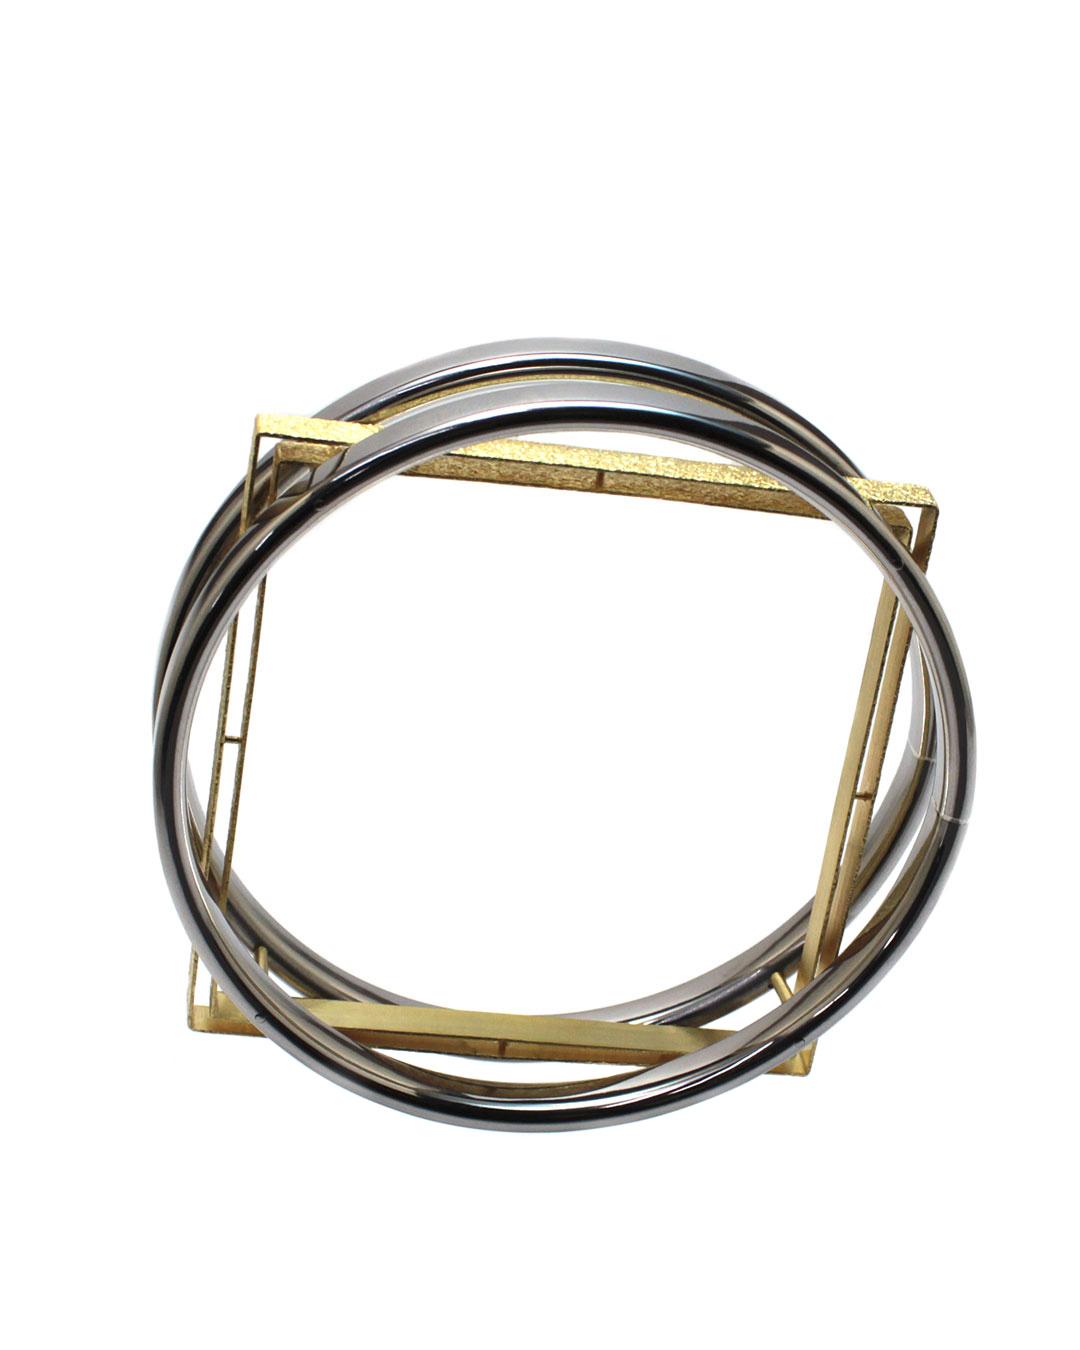 Okinari Kurokawa, untitled, 2014, bracelet; 20ct gold, stainless steel, 83 x 83 x 20 mm, €3900